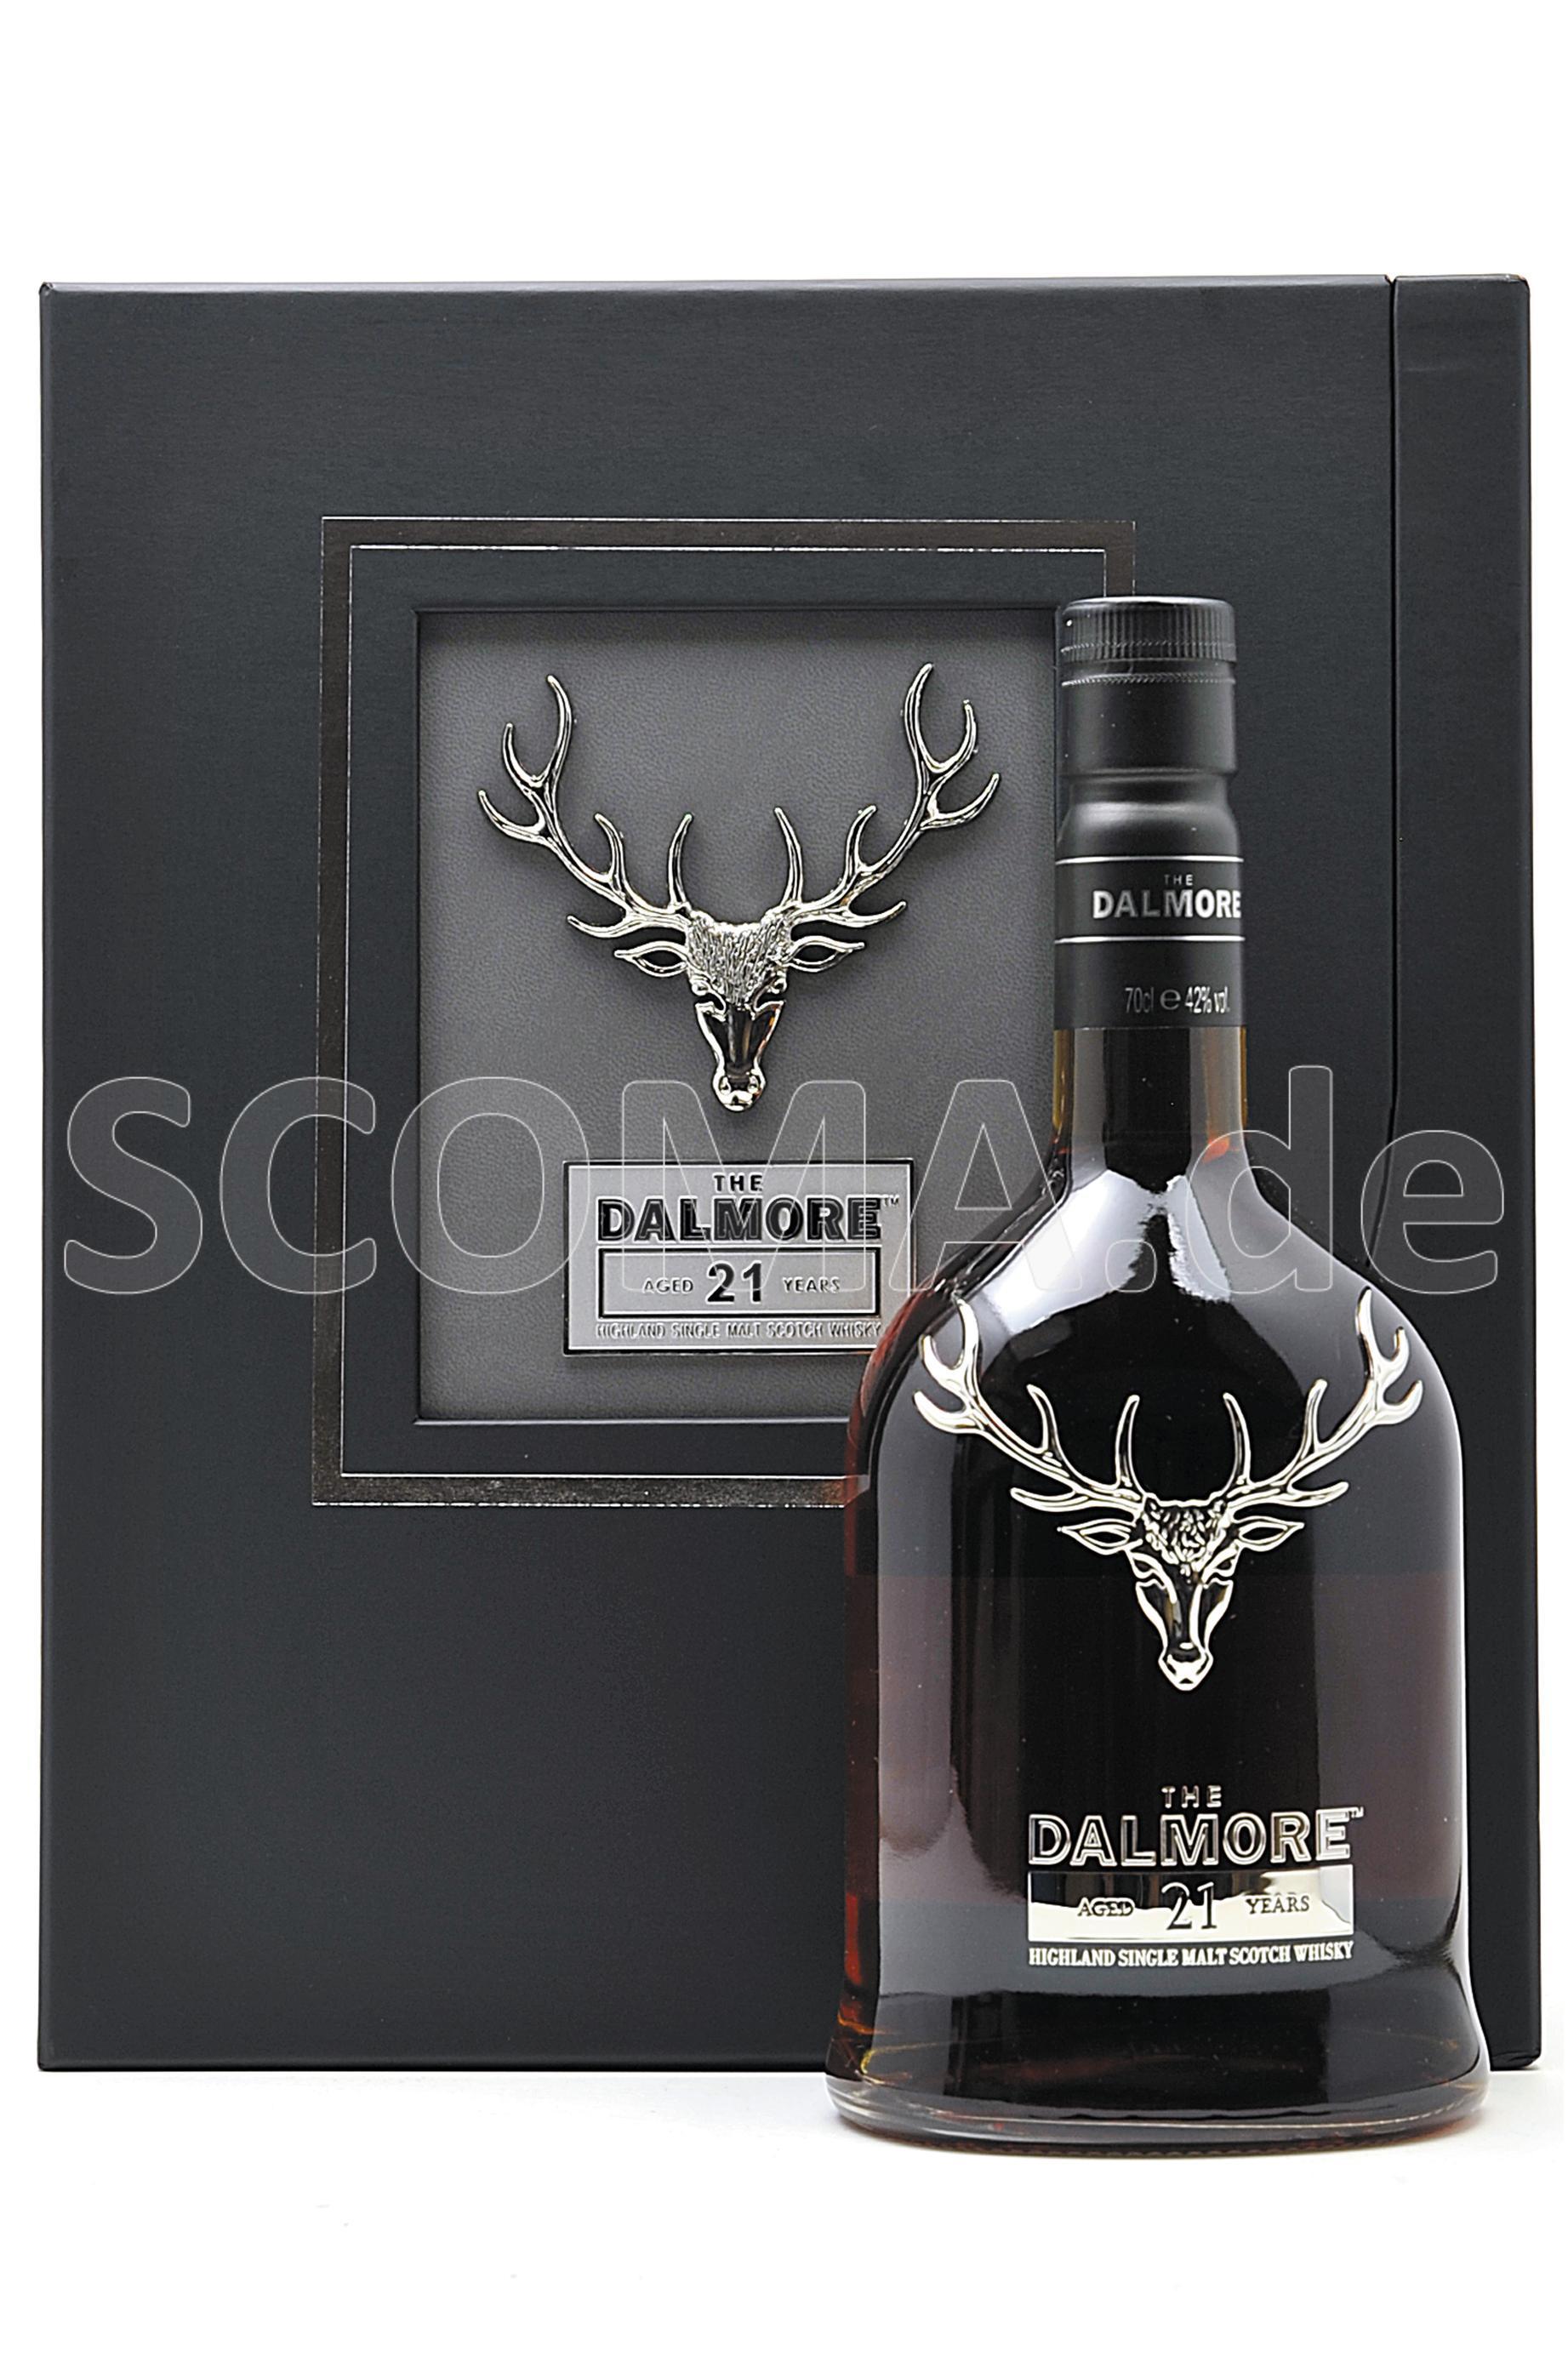 Dalmore 21 years